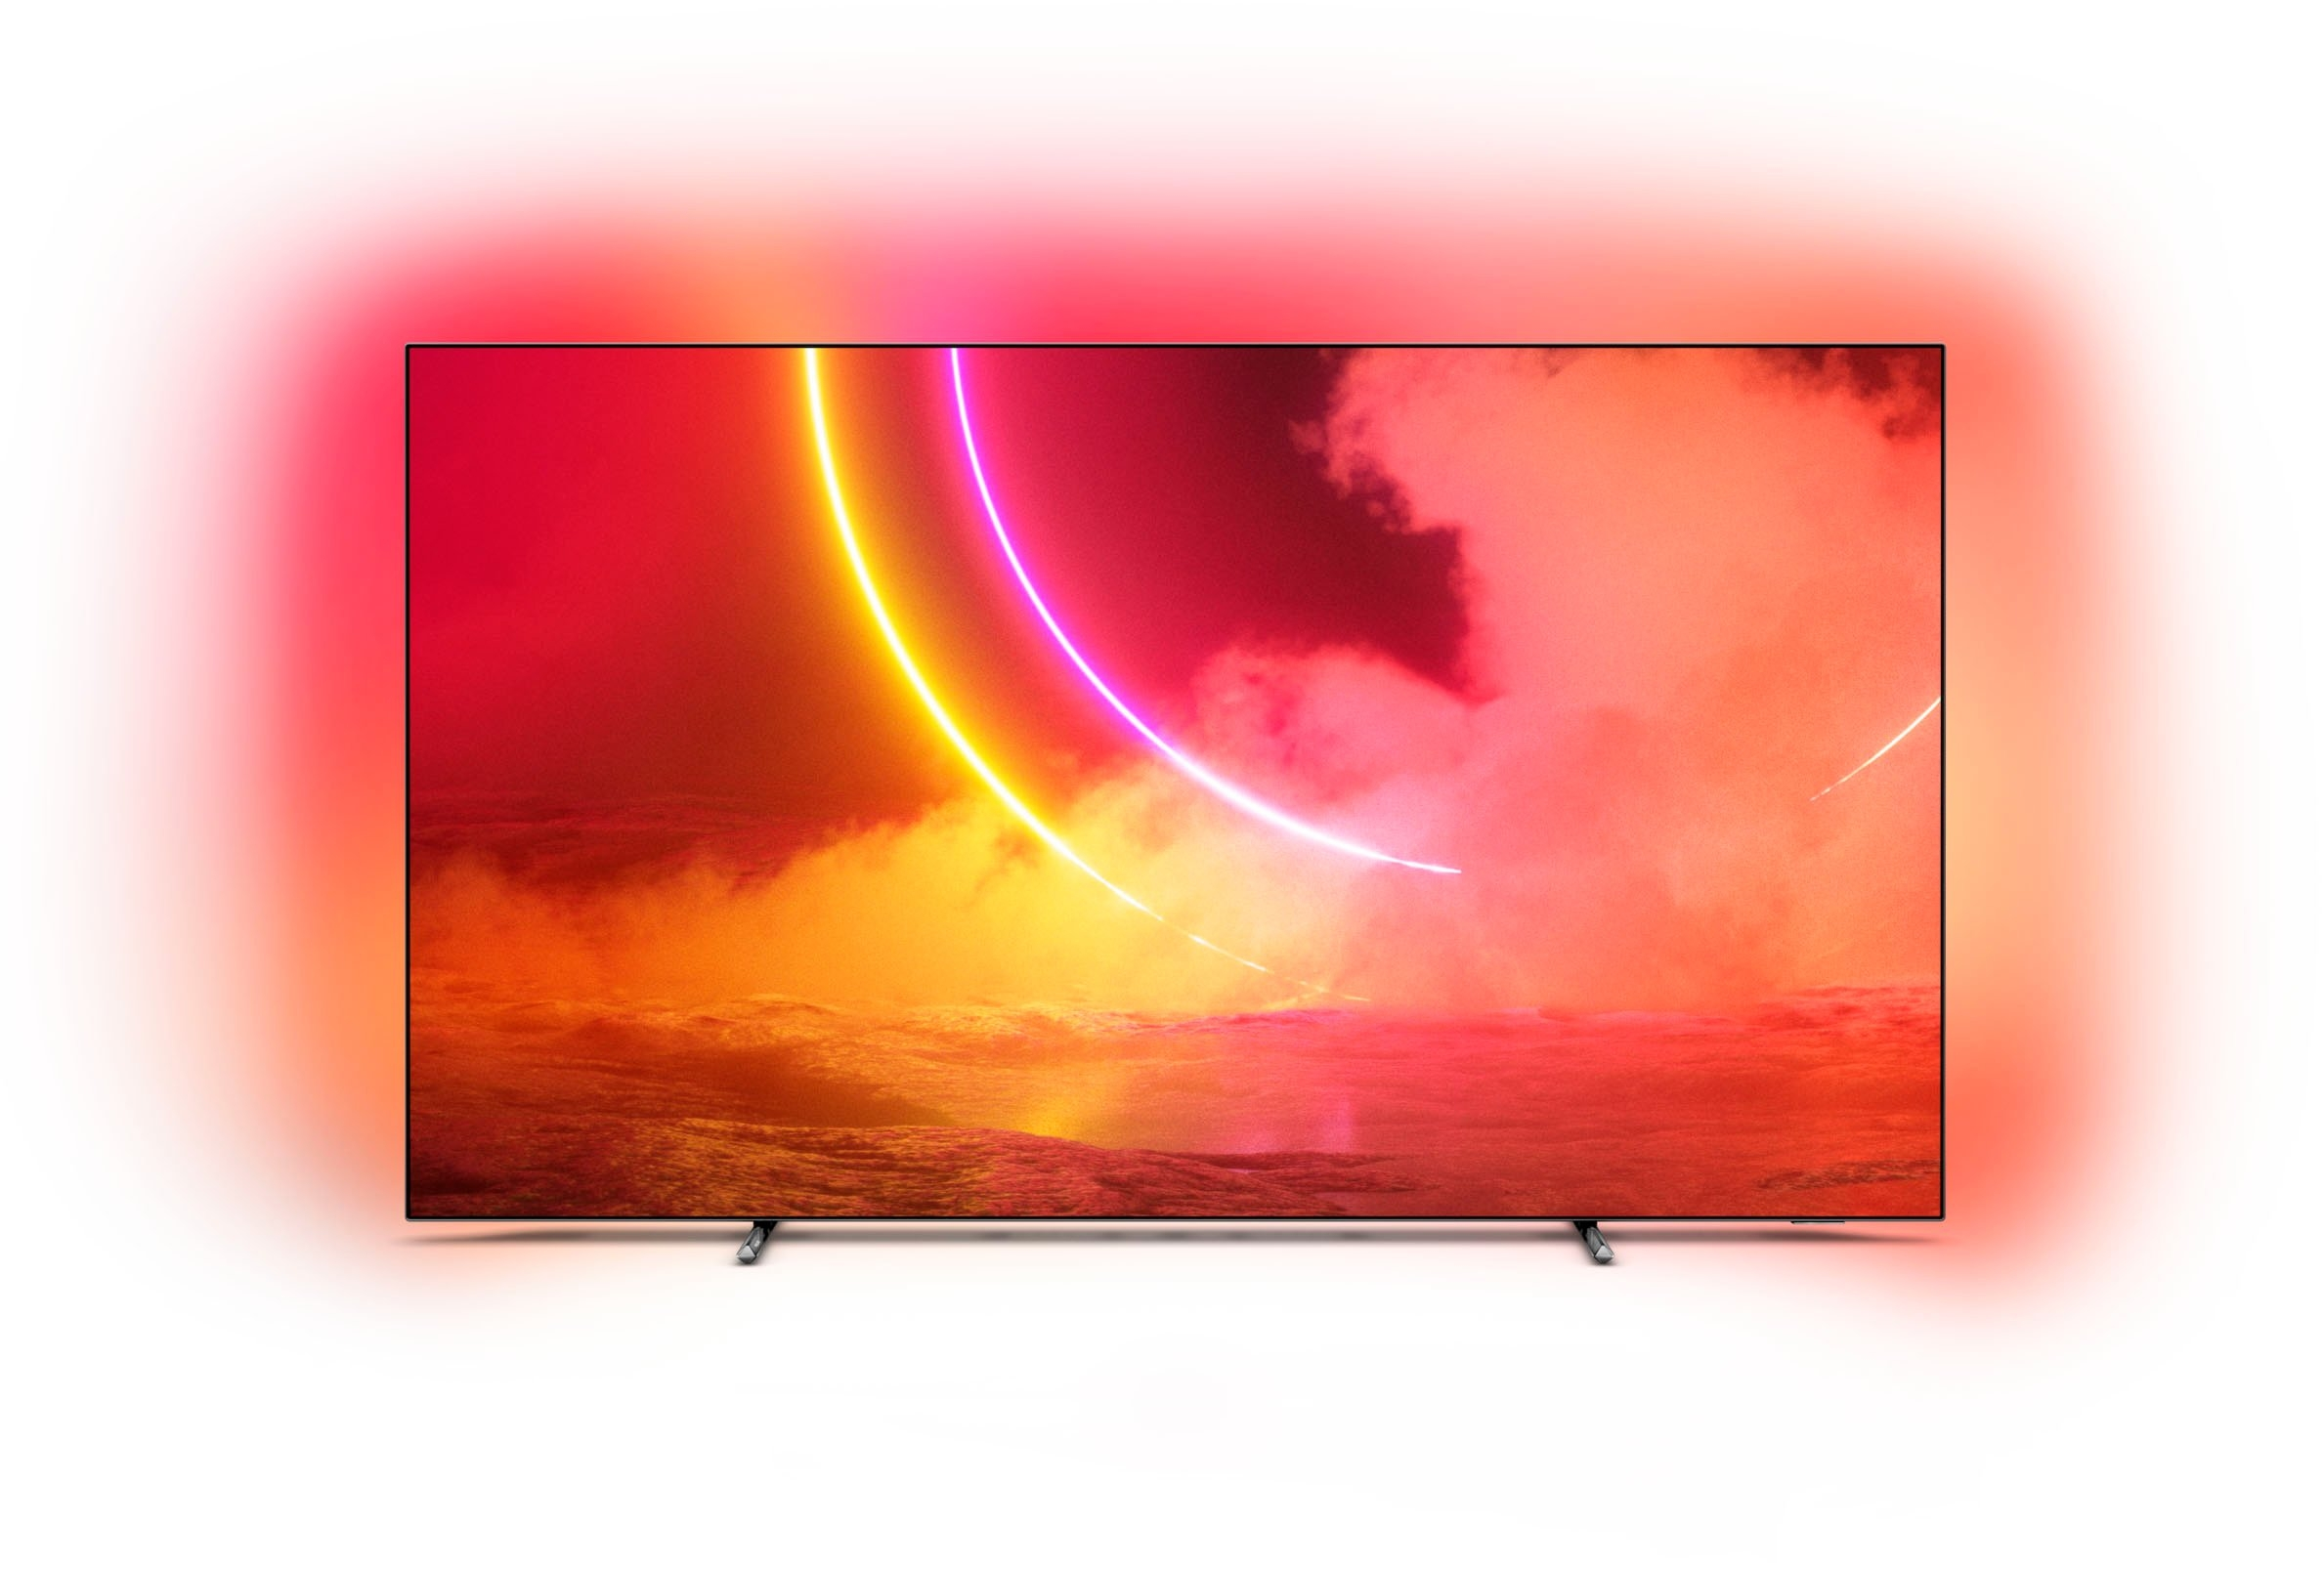 Philips »65OLED805« OLED-TV - verschillende betaalmethodes